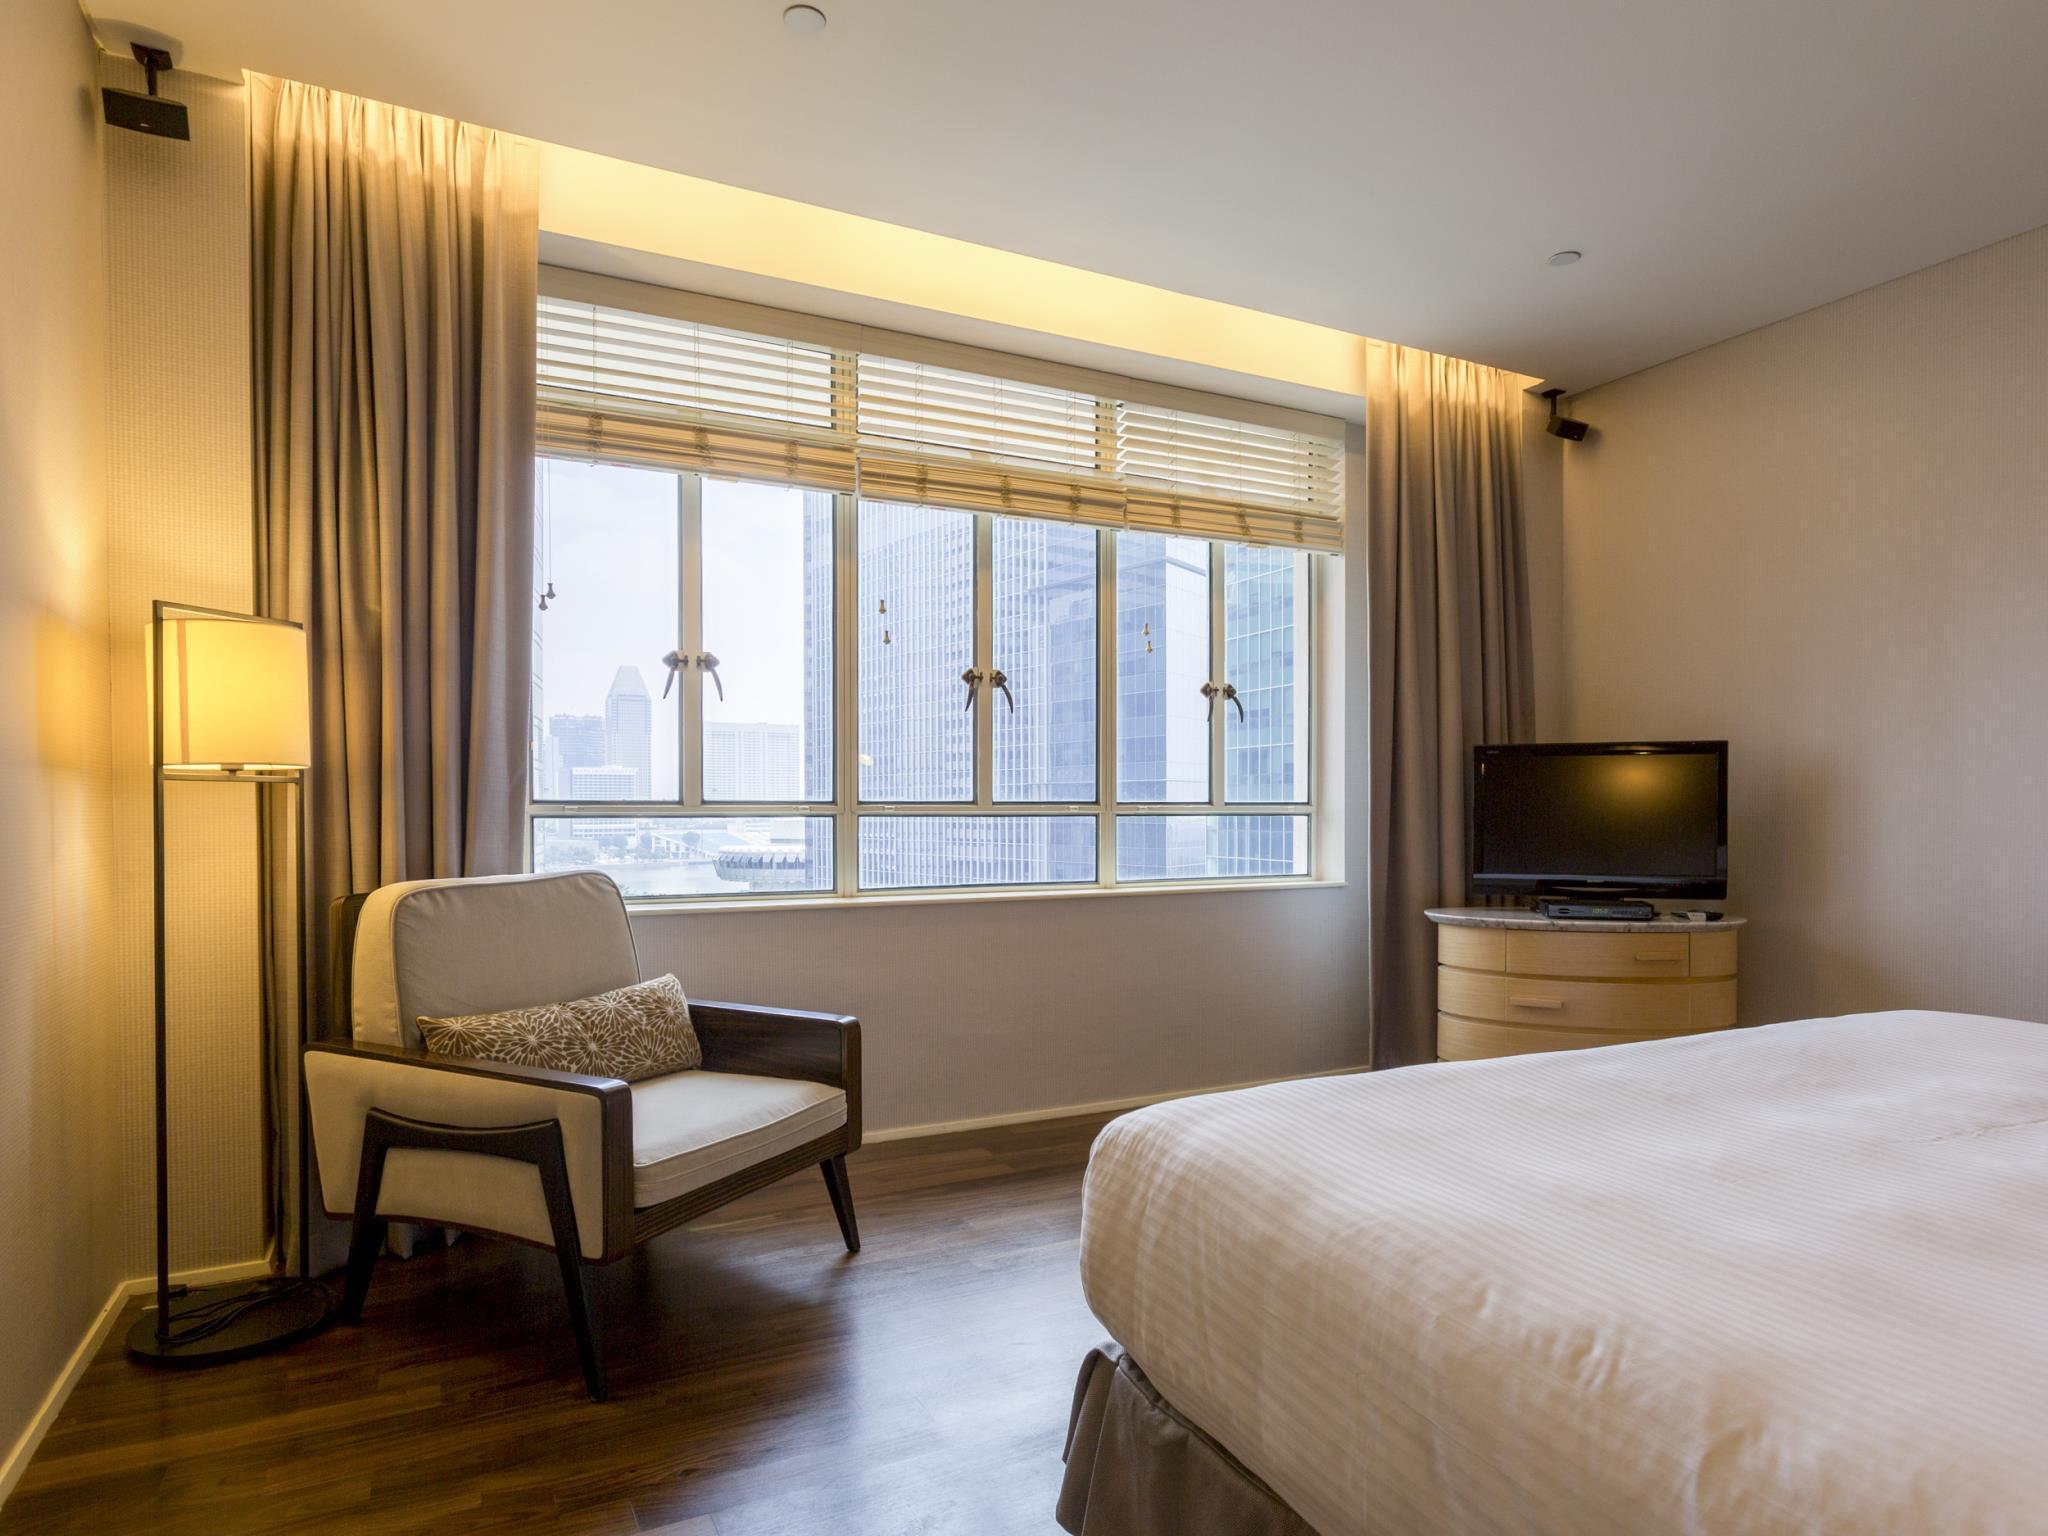 cutler kitchen and bath average cabinet cost 新加坡新加坡雅诗阁来福士广场酒店 ascott raffles place singapore cullen套房 suite